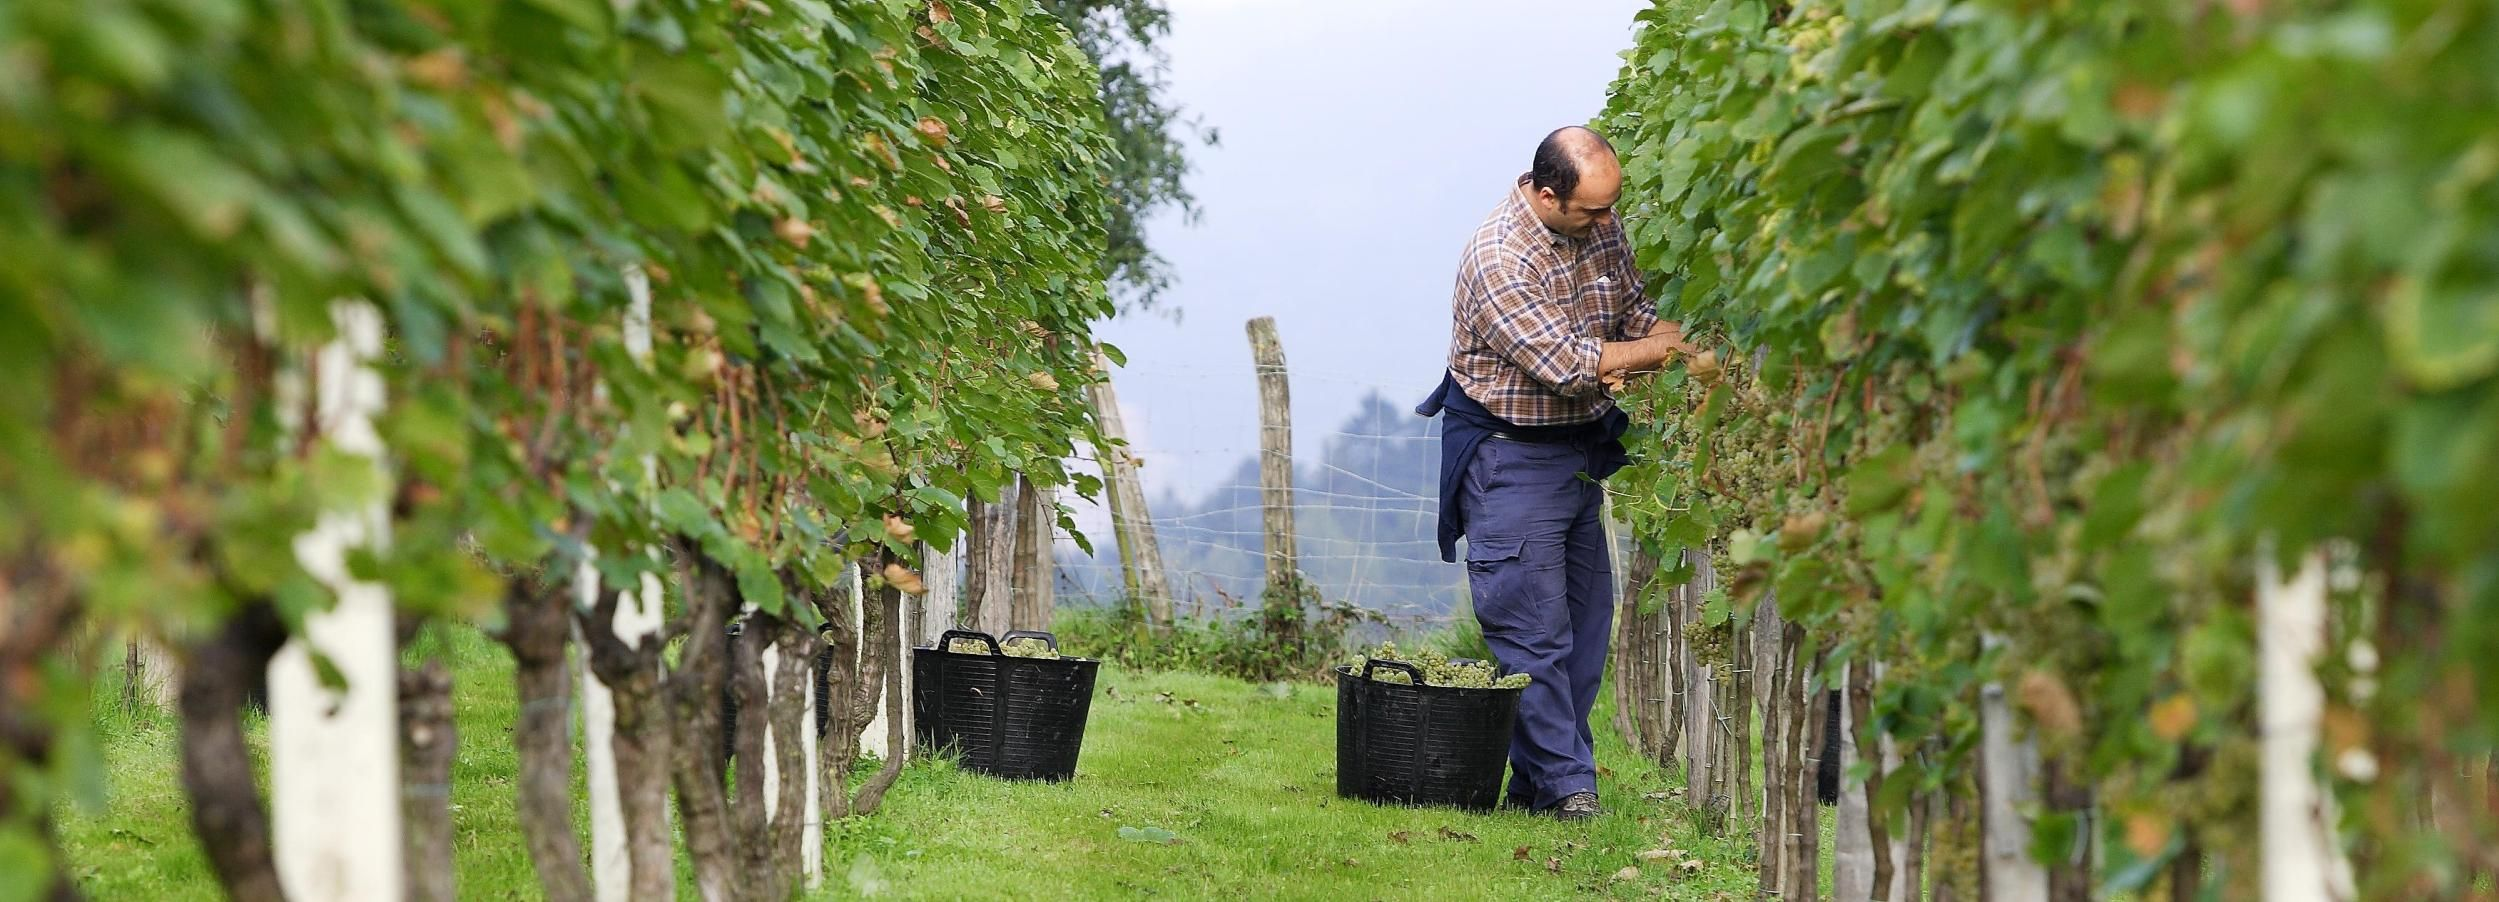 Txakoli Winery Visit and Getaria & Zarautz Villages Tour